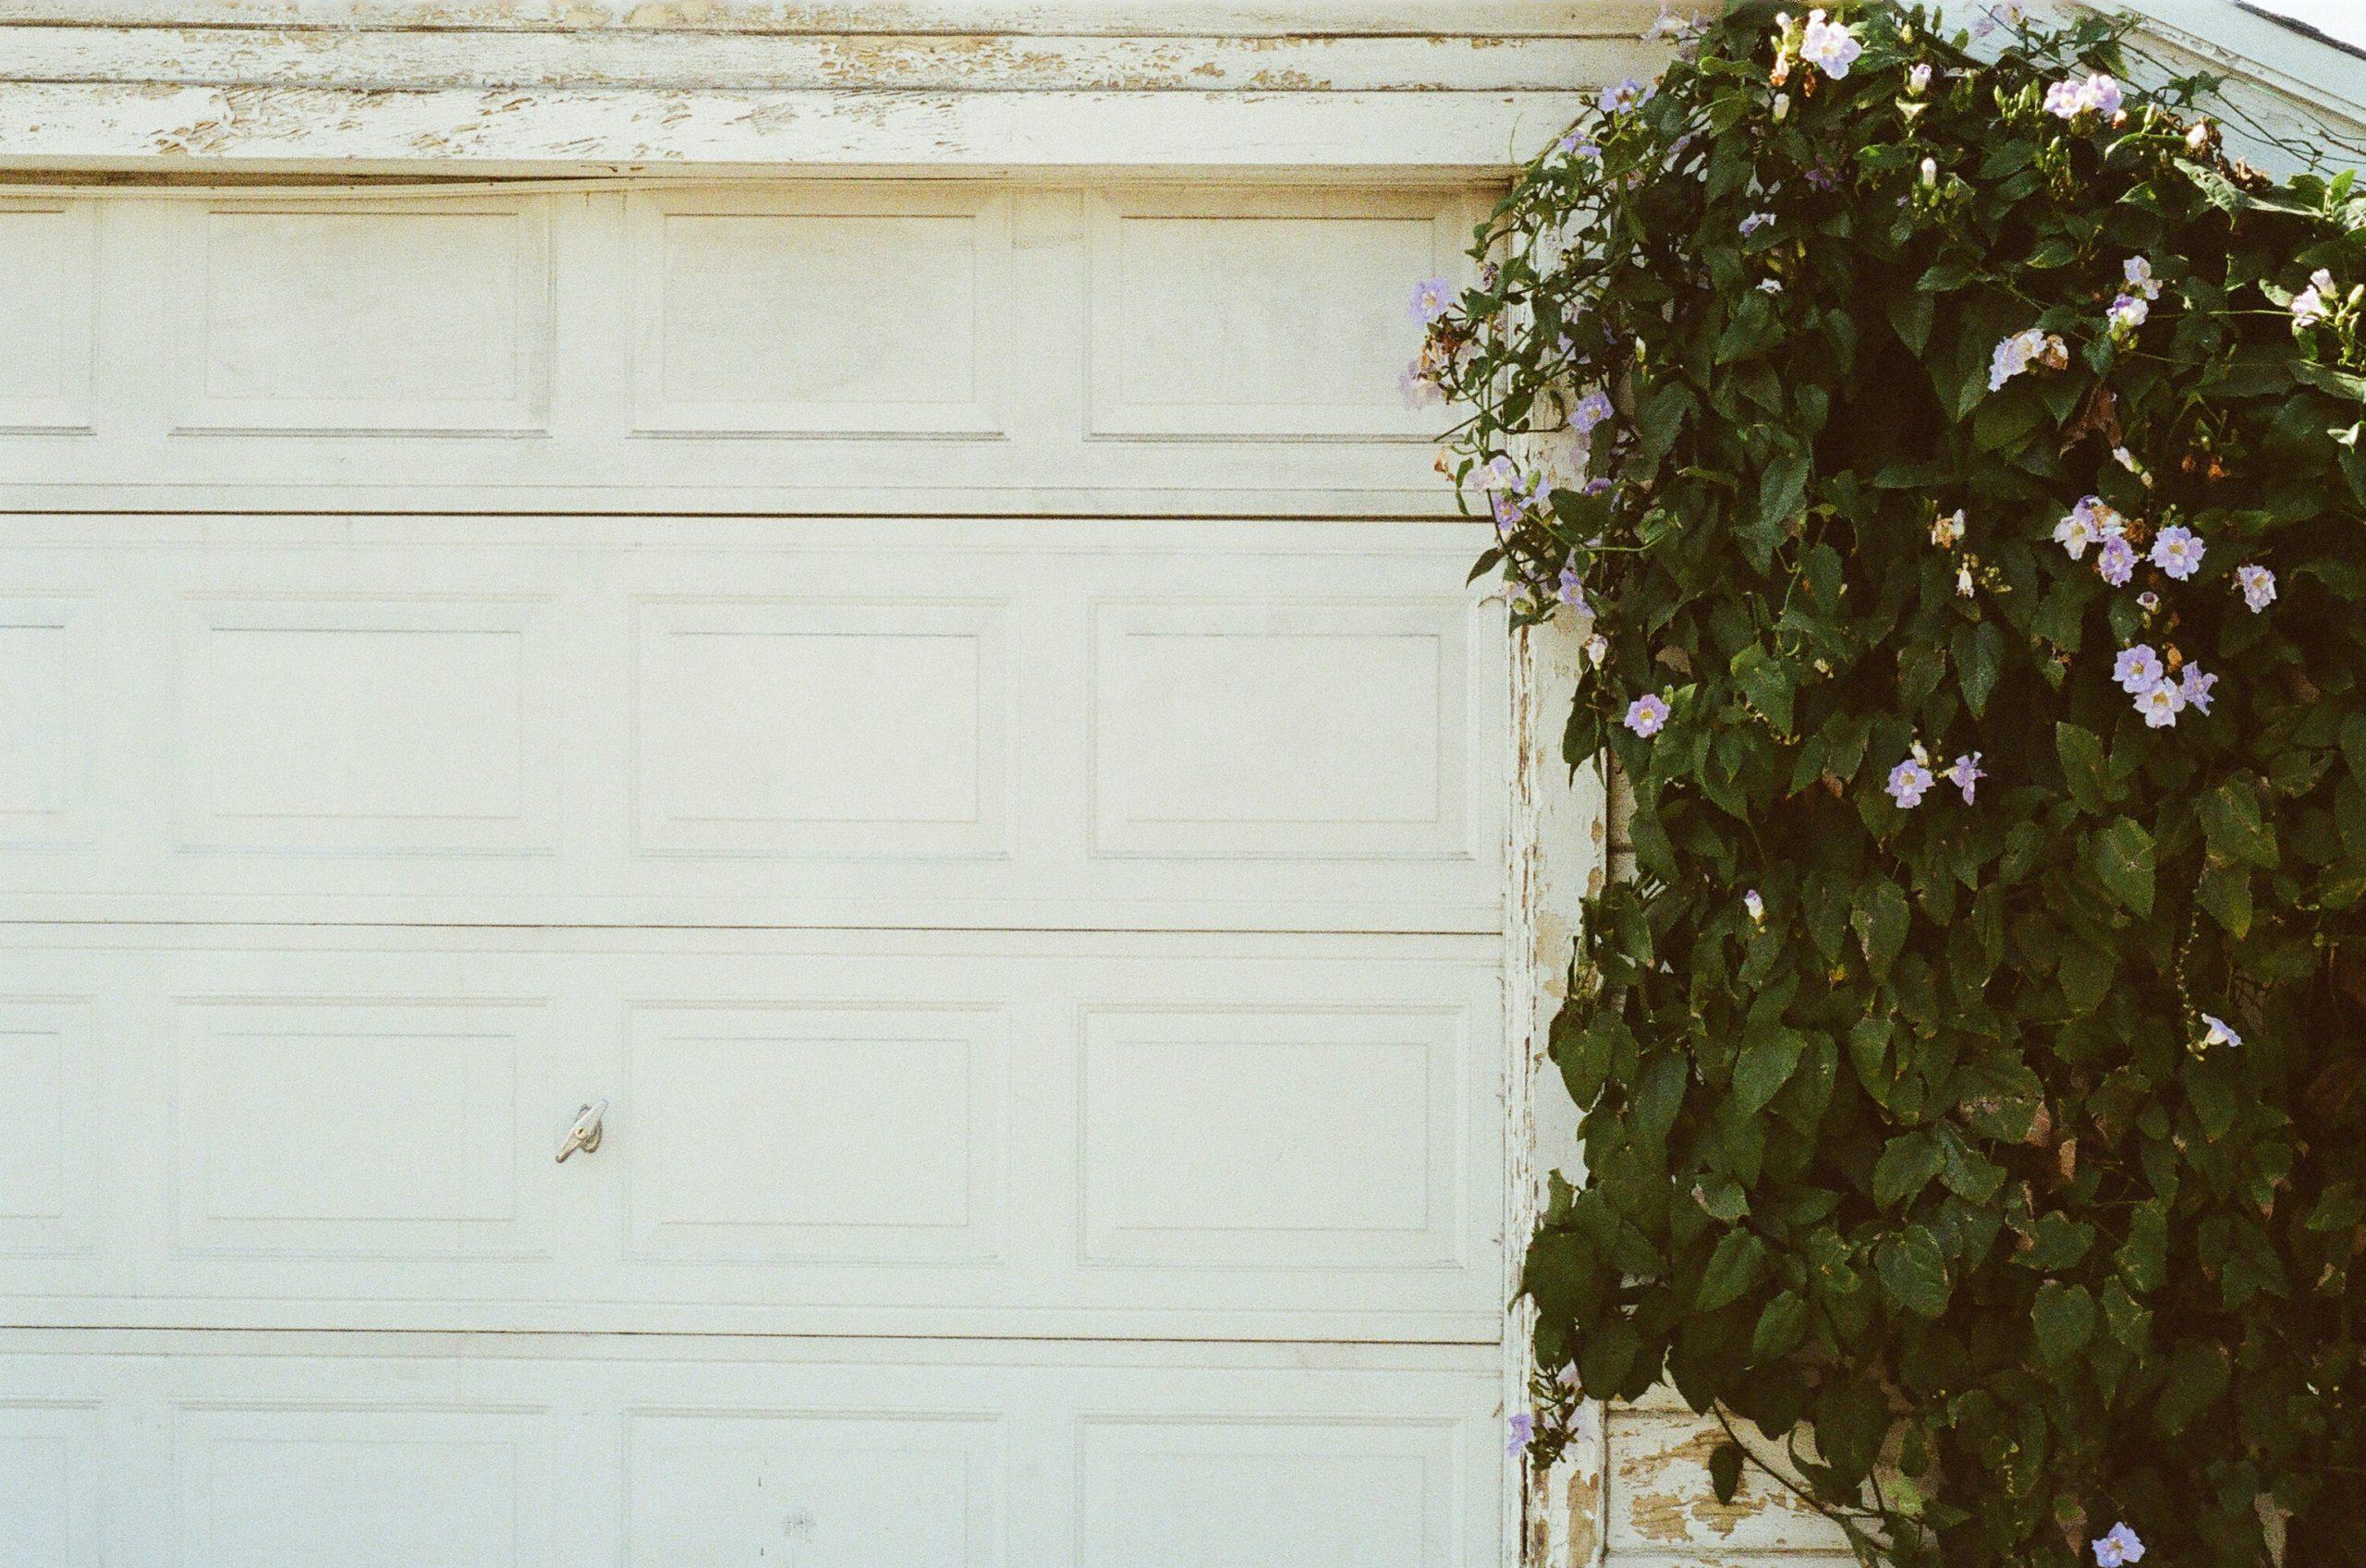 A garage door next to a tree.